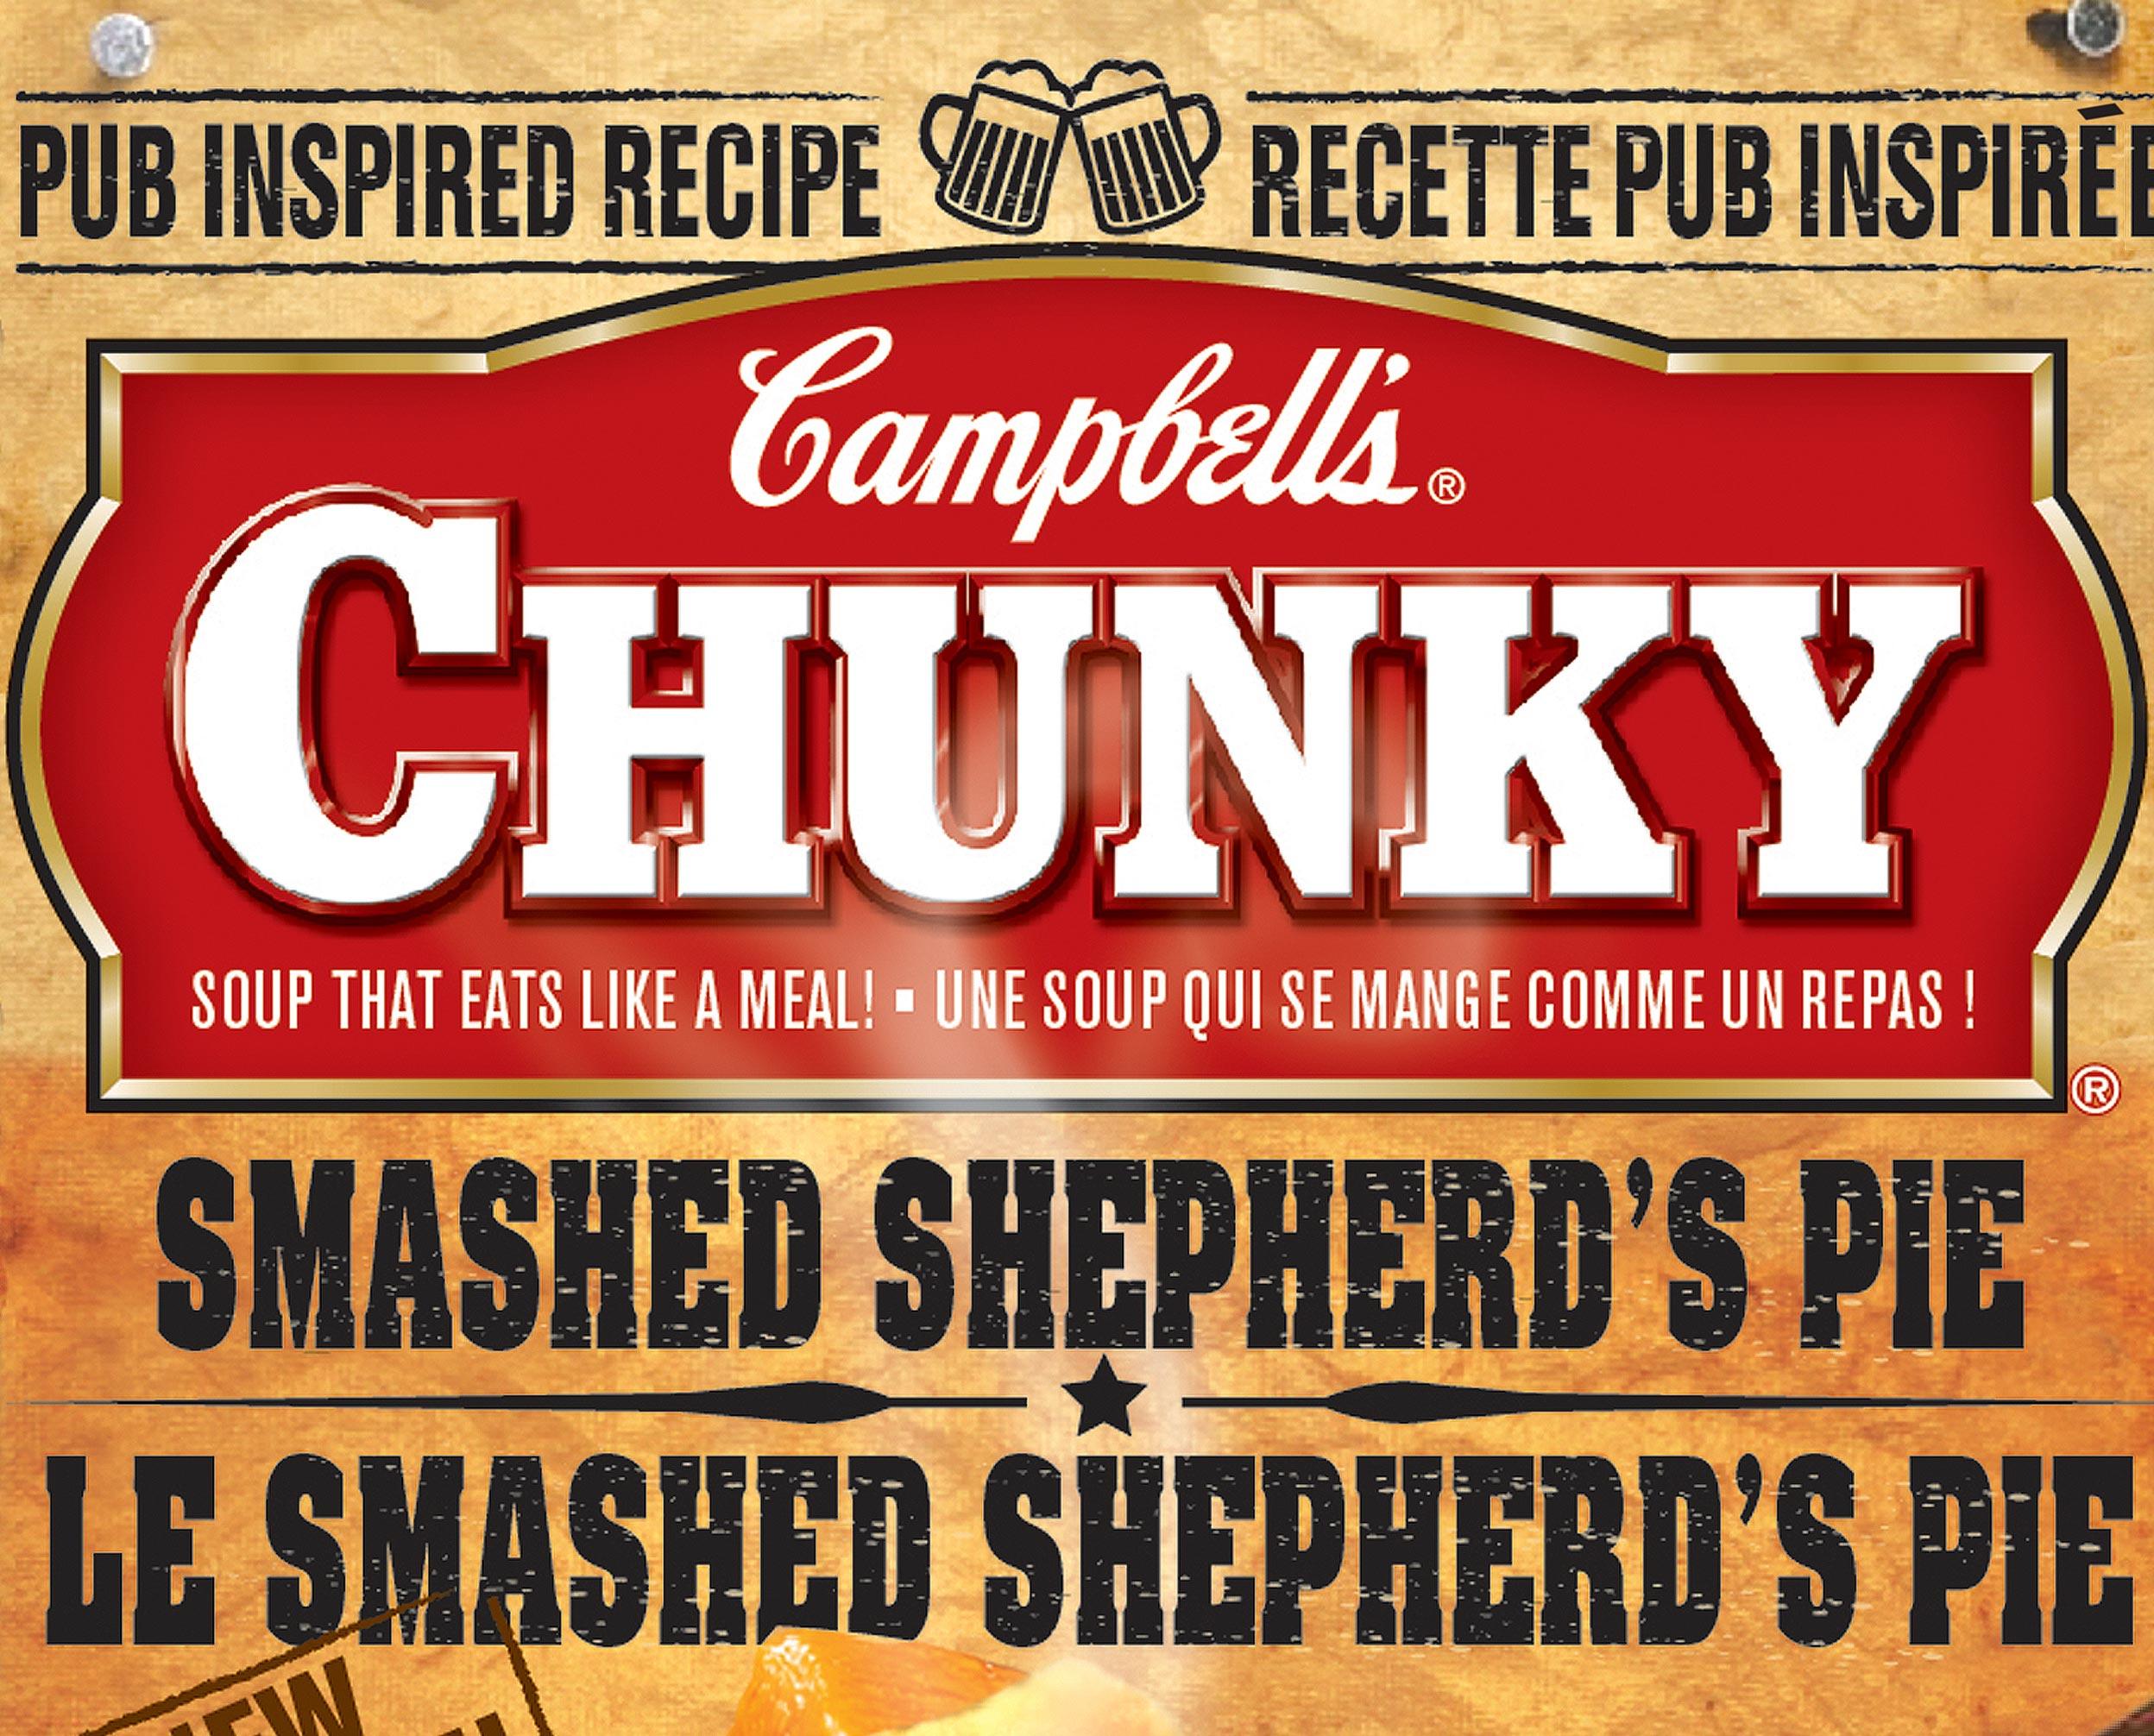 Campbell's Pub Inspired label design